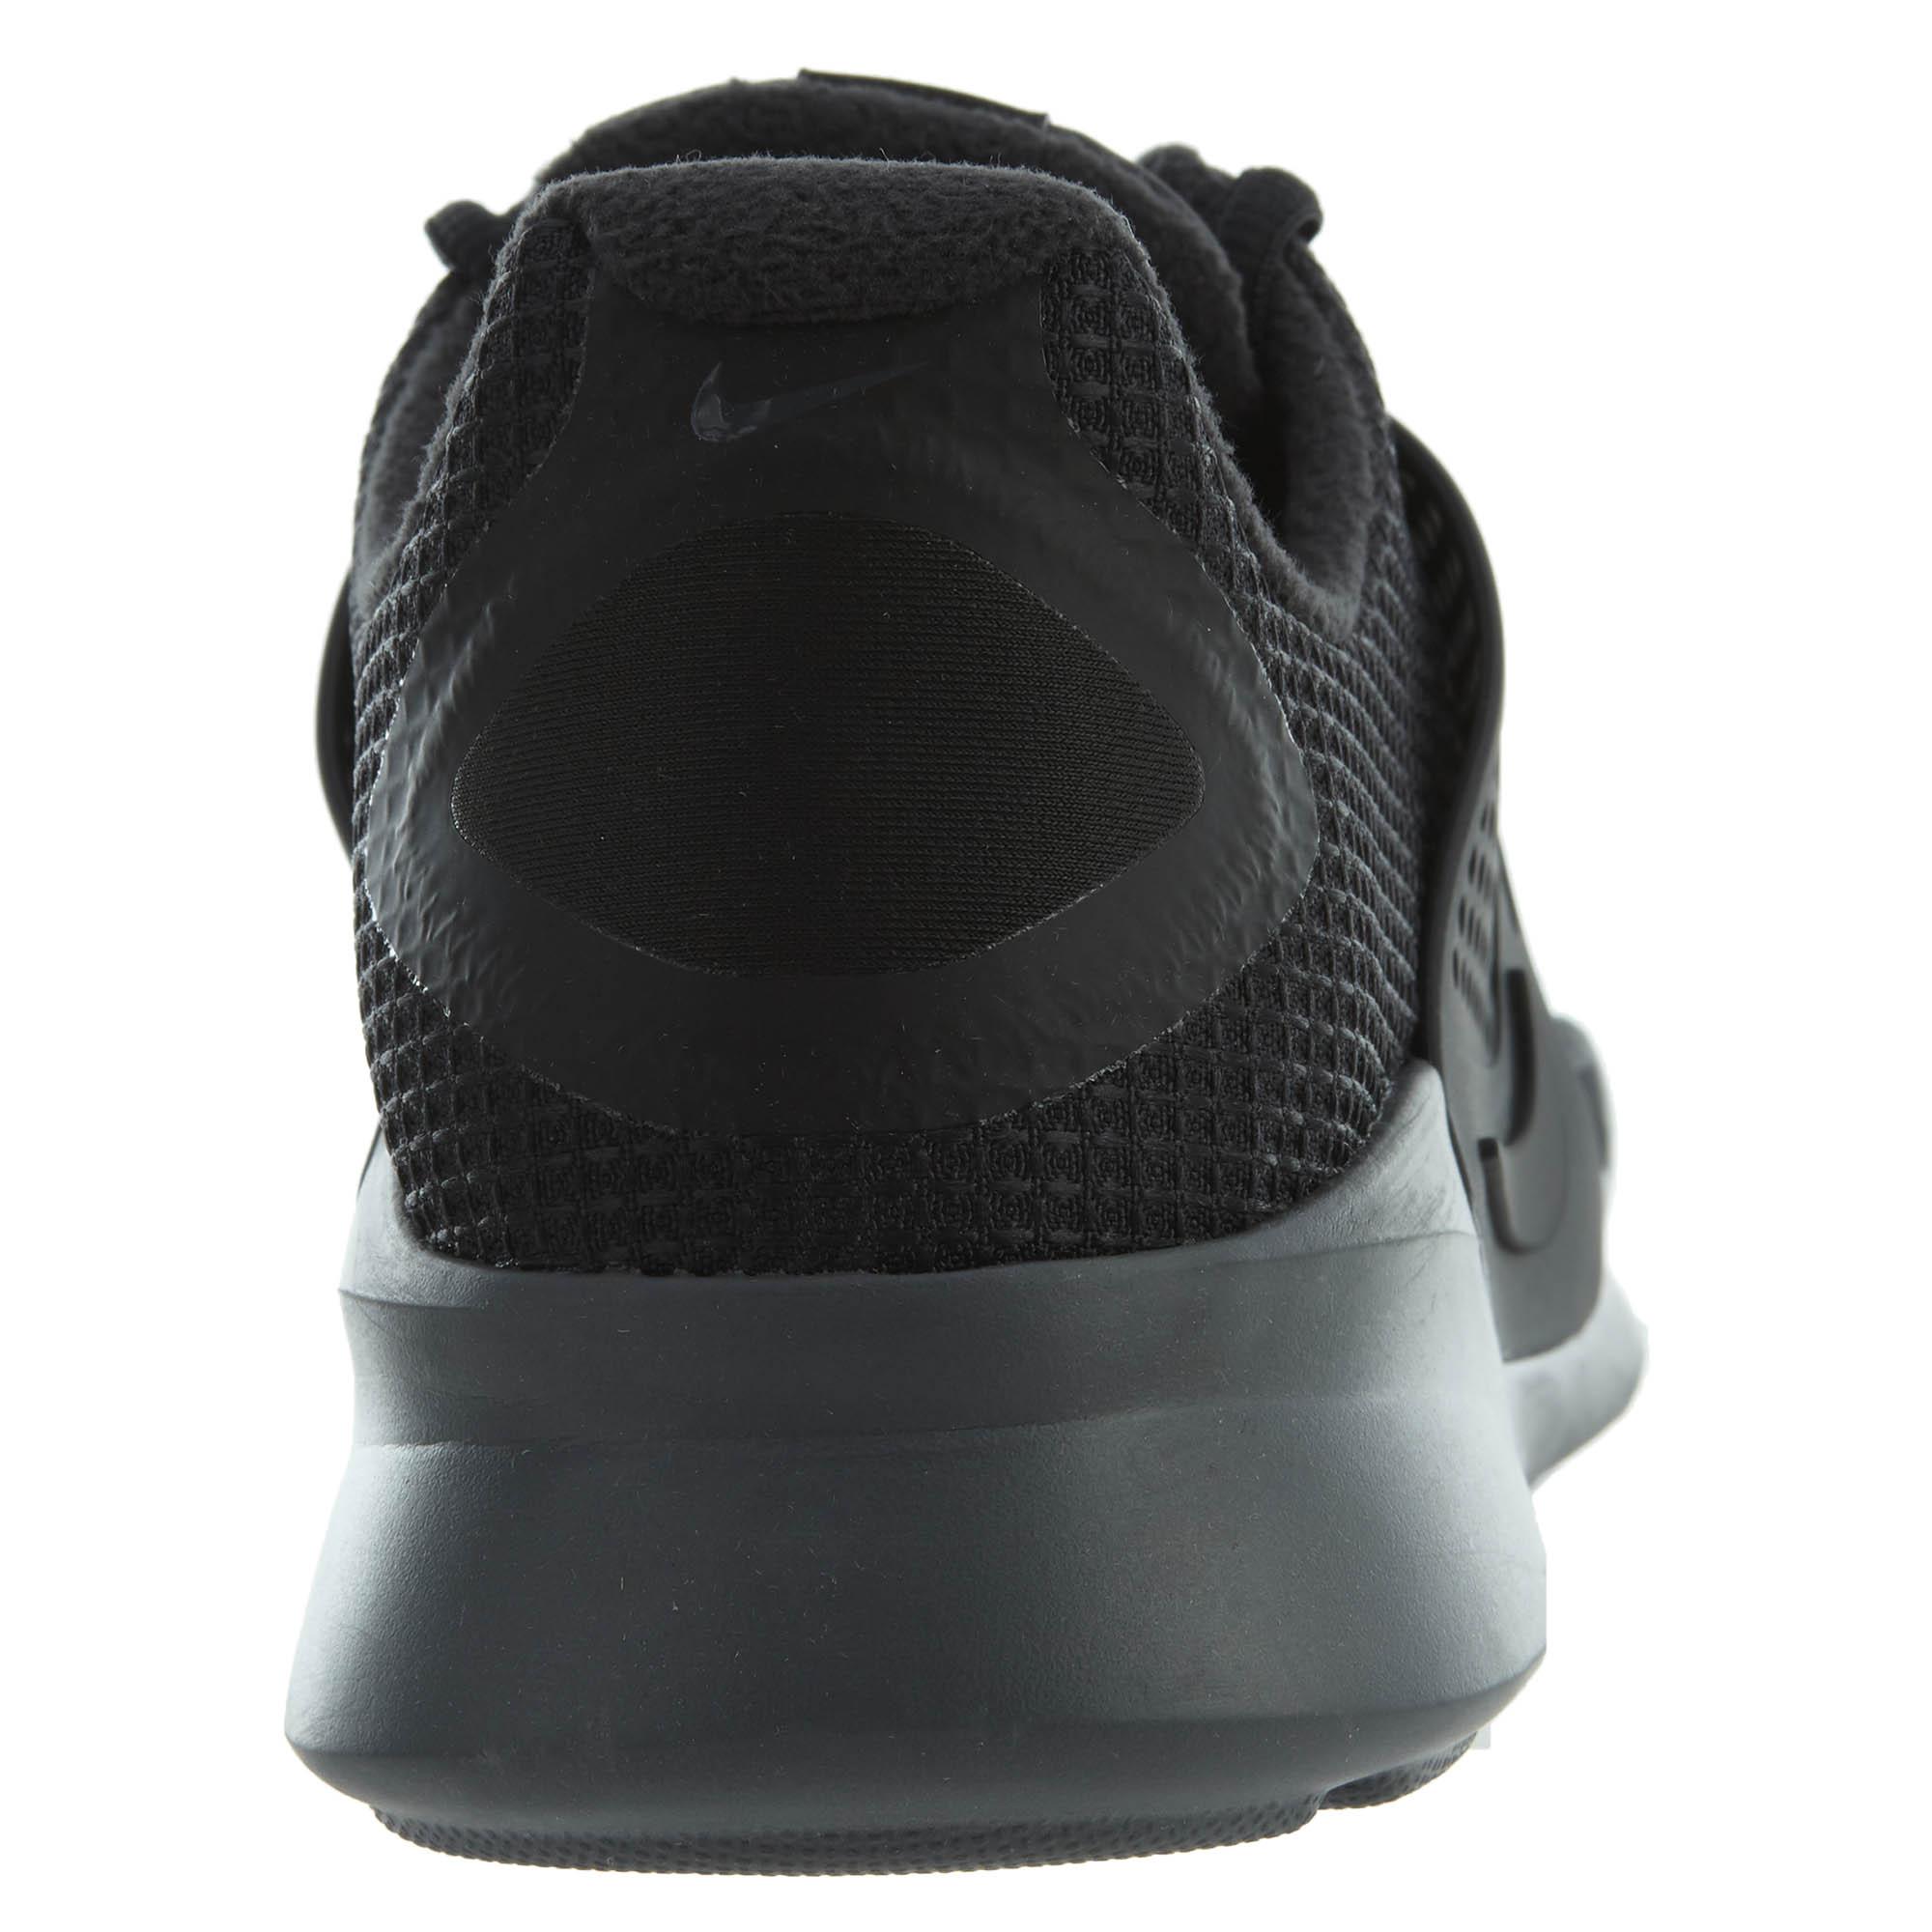 Nike Arrowz Se Mens Style : 916772